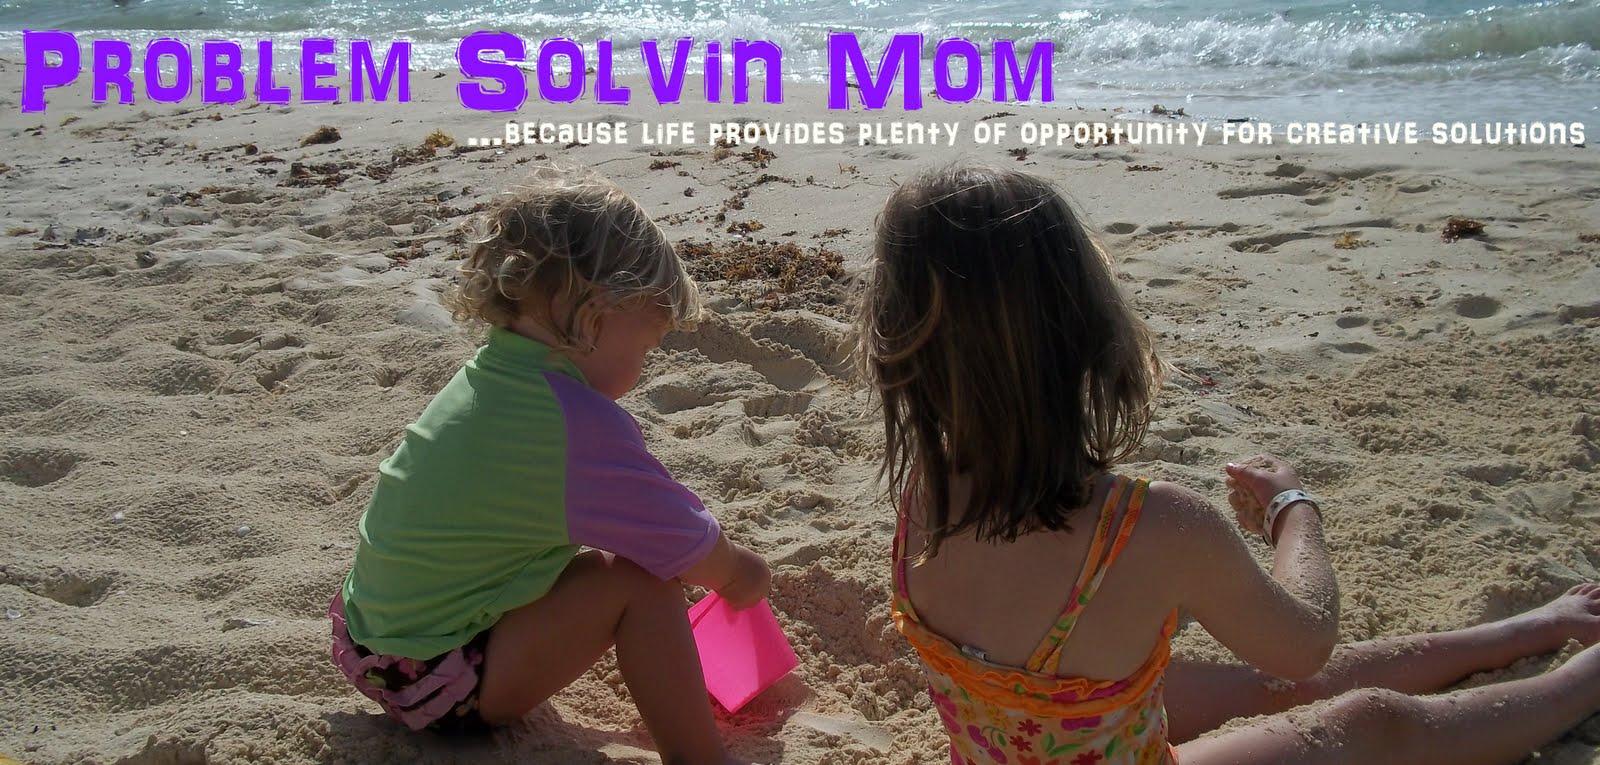 Problem Solvin' Mom